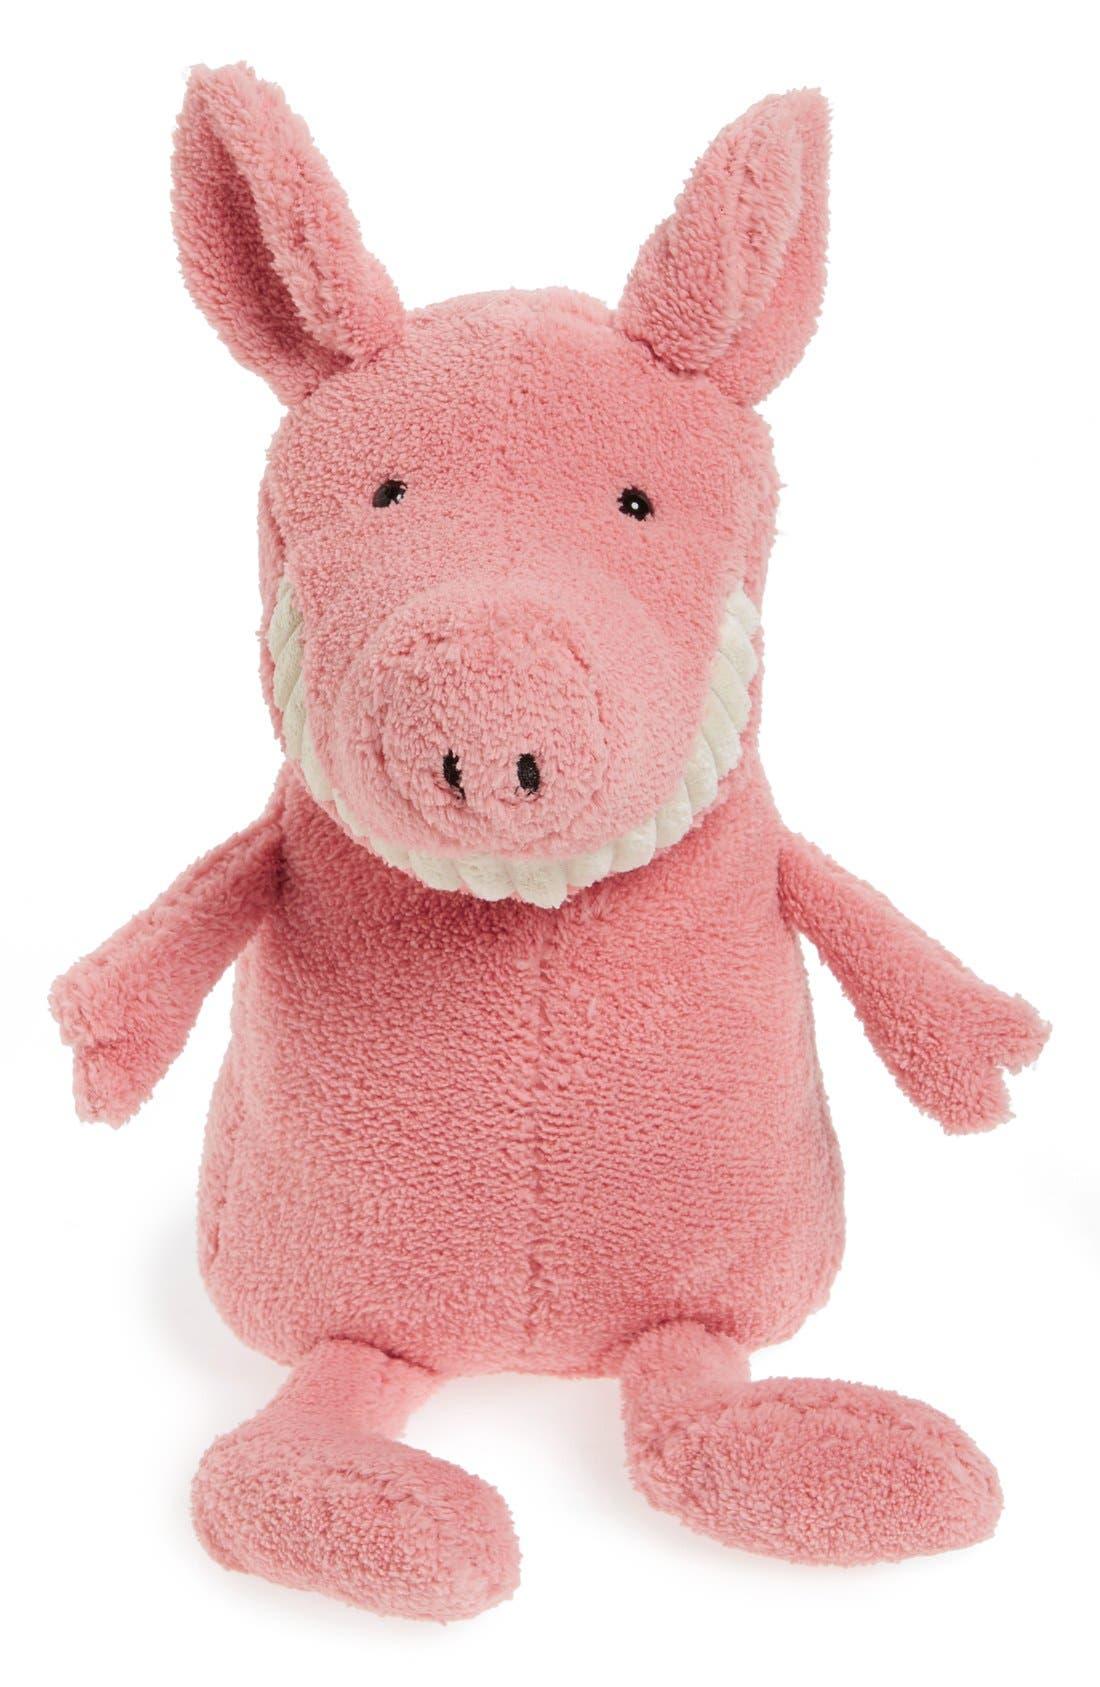 Alternate Image 1 Selected - Jellycat 'Medium Toothy Pig' Stuffed Animal